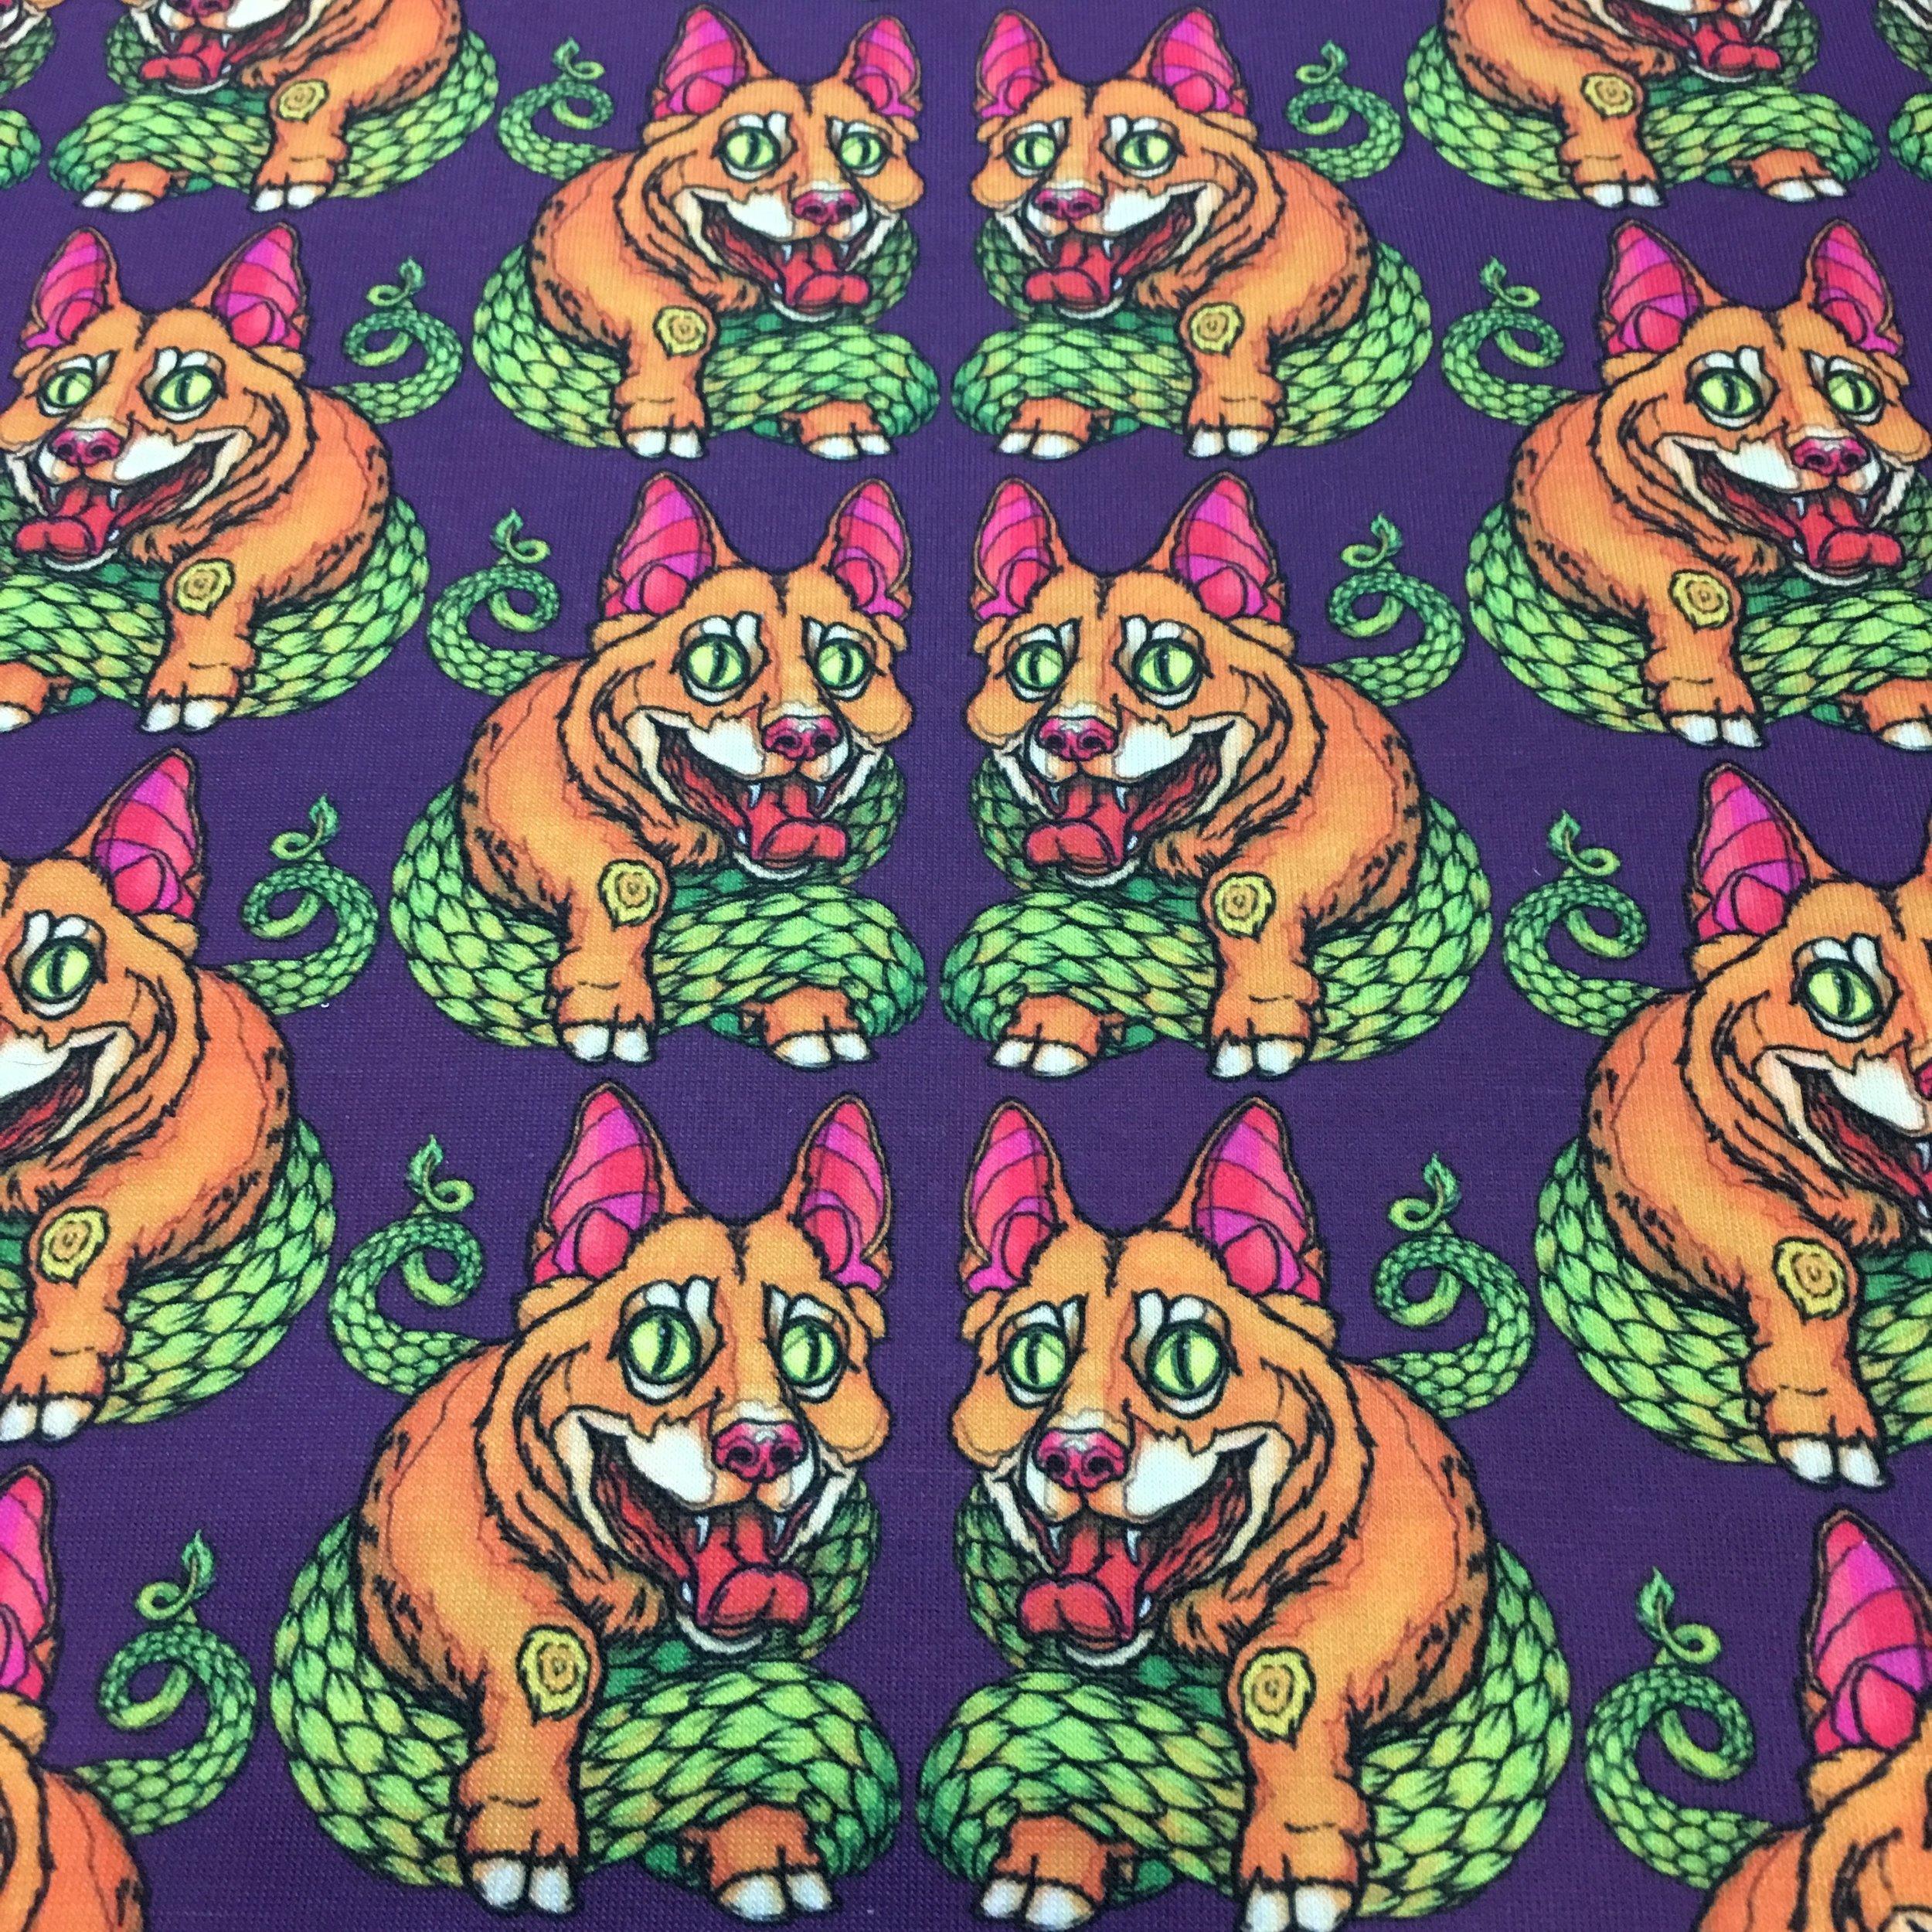 Sir Bandit Fabric